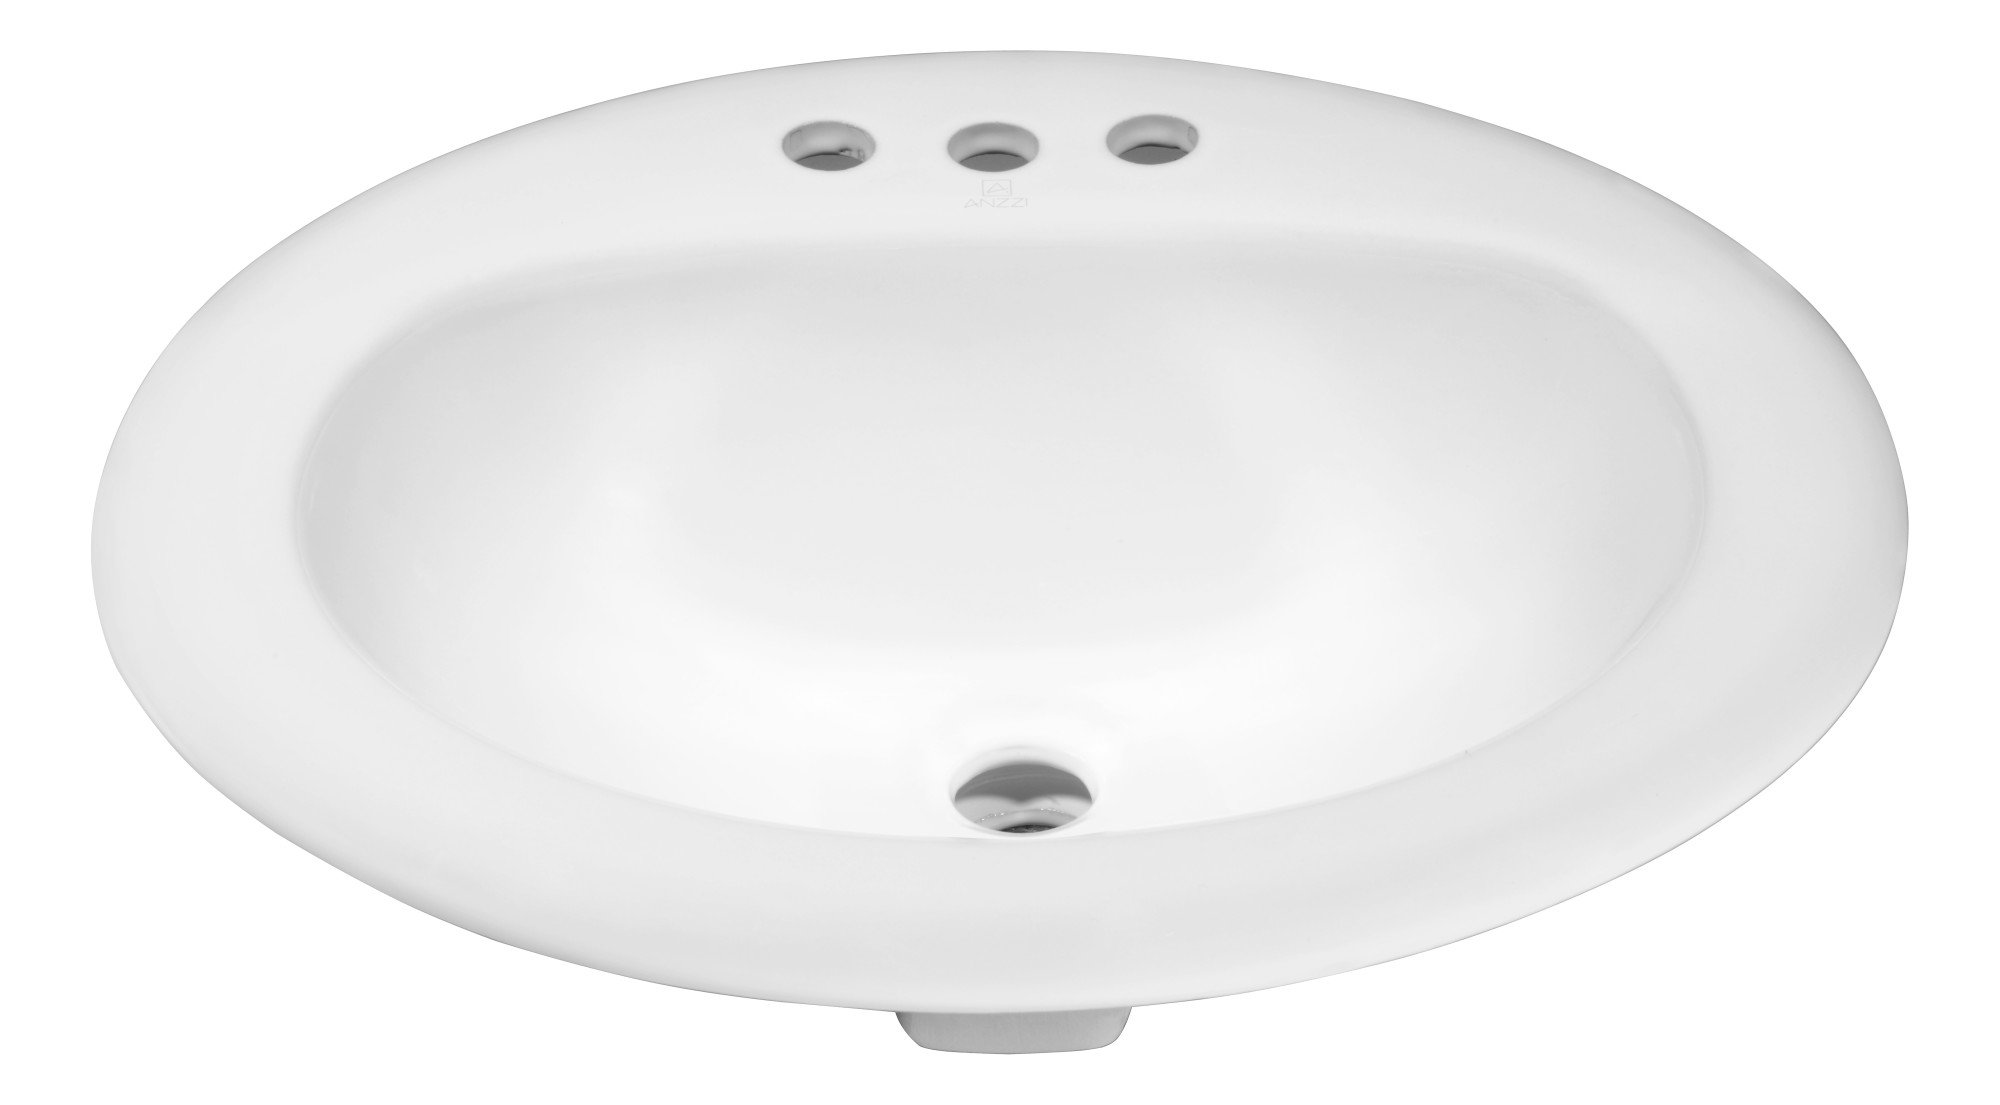 20.5'' Ceramic Drop-In Sink - Glossy White - Cadenza Series LS-AZ097 - ANZZI